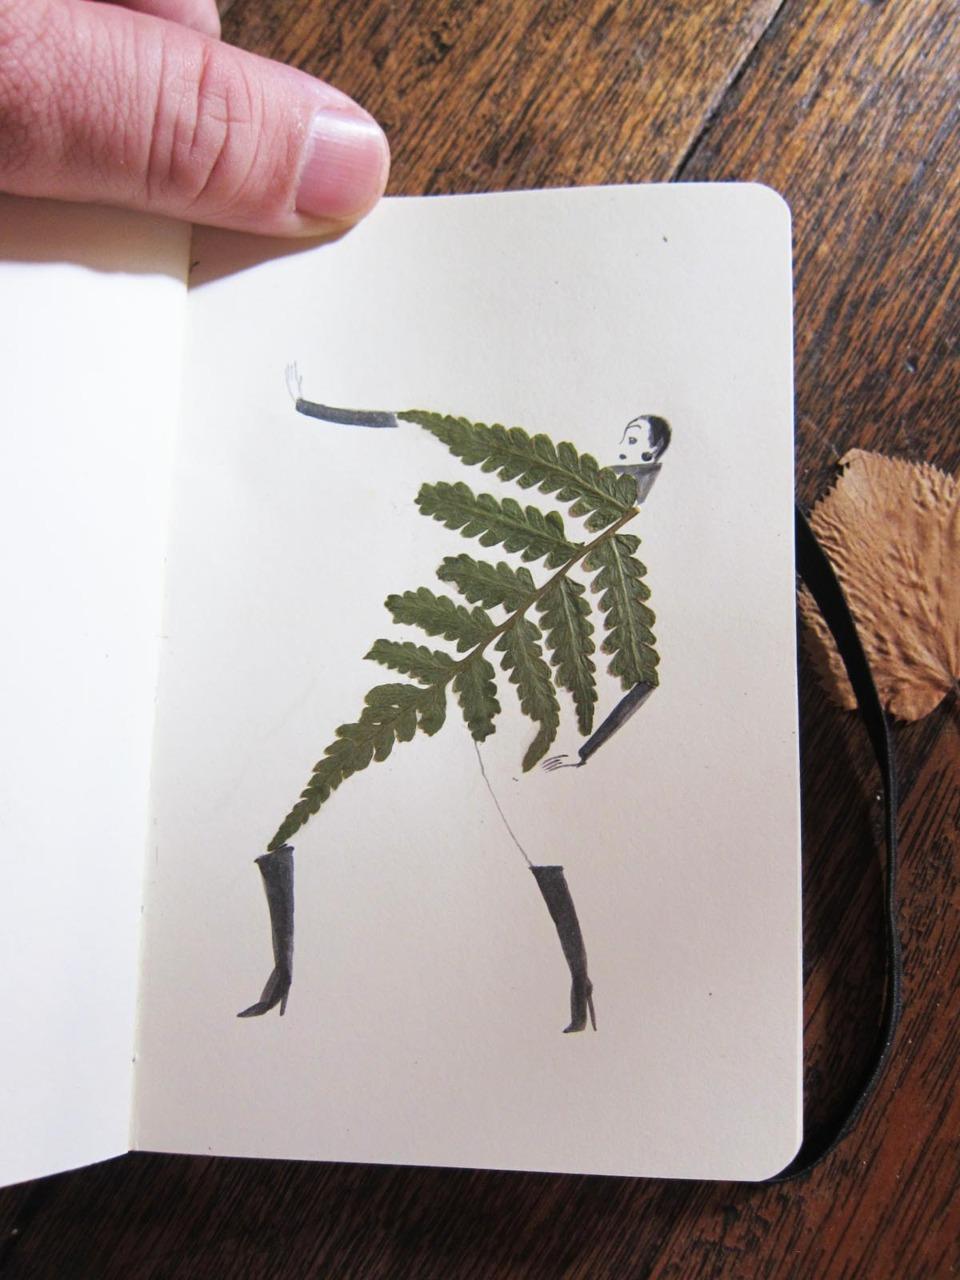 herbier feuille illustration 03 Un herbier illustré